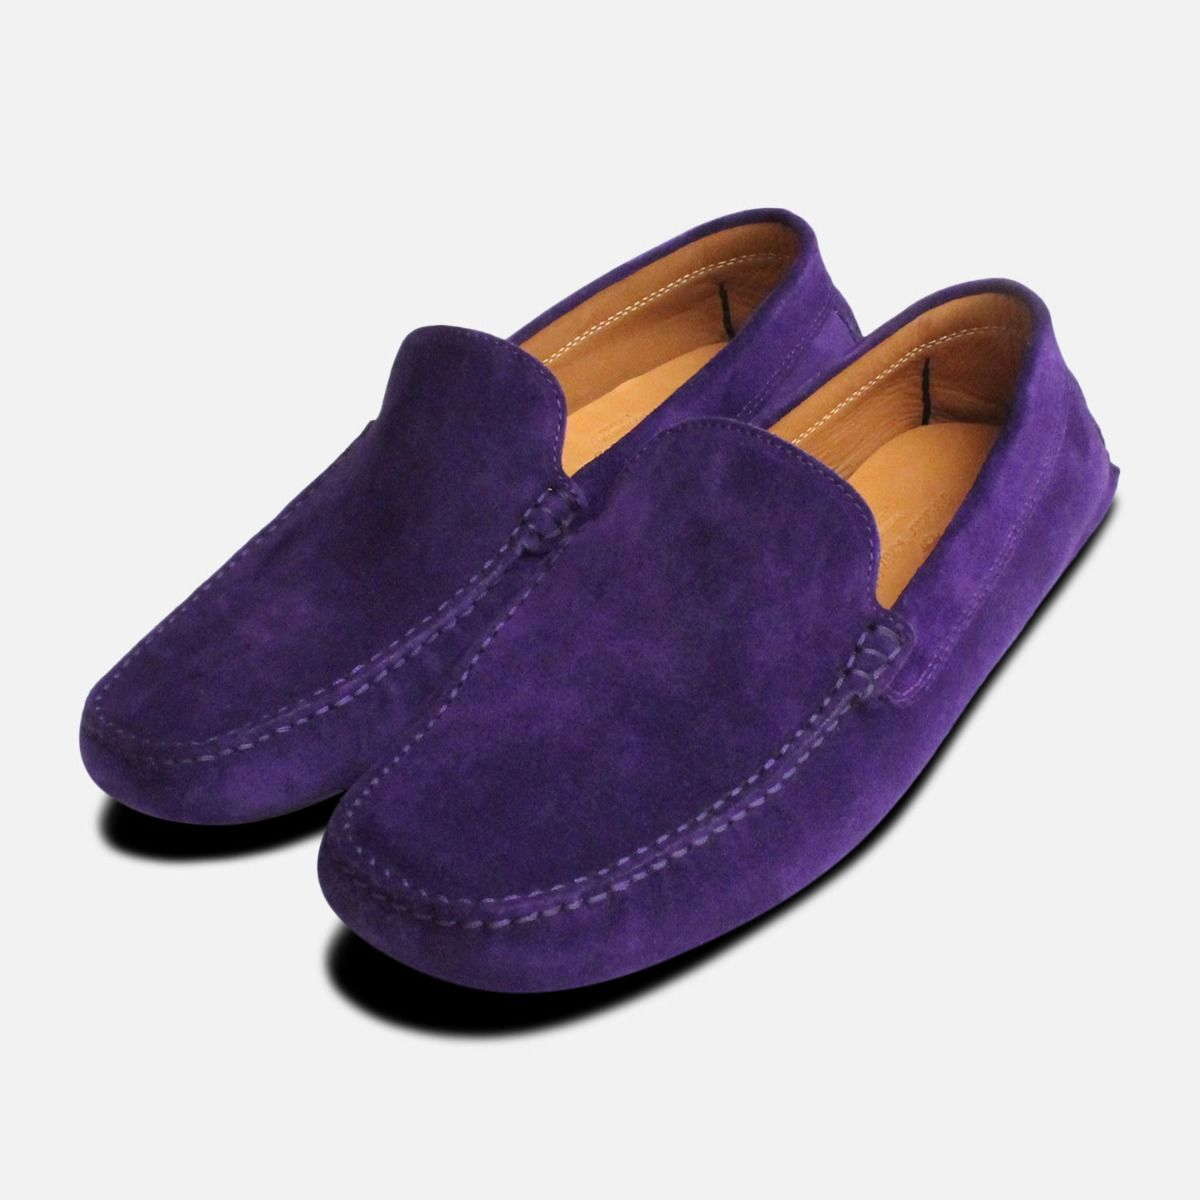 ac465632b29 Deep Purple Italian Moccasins by Arthur Knight Shoes